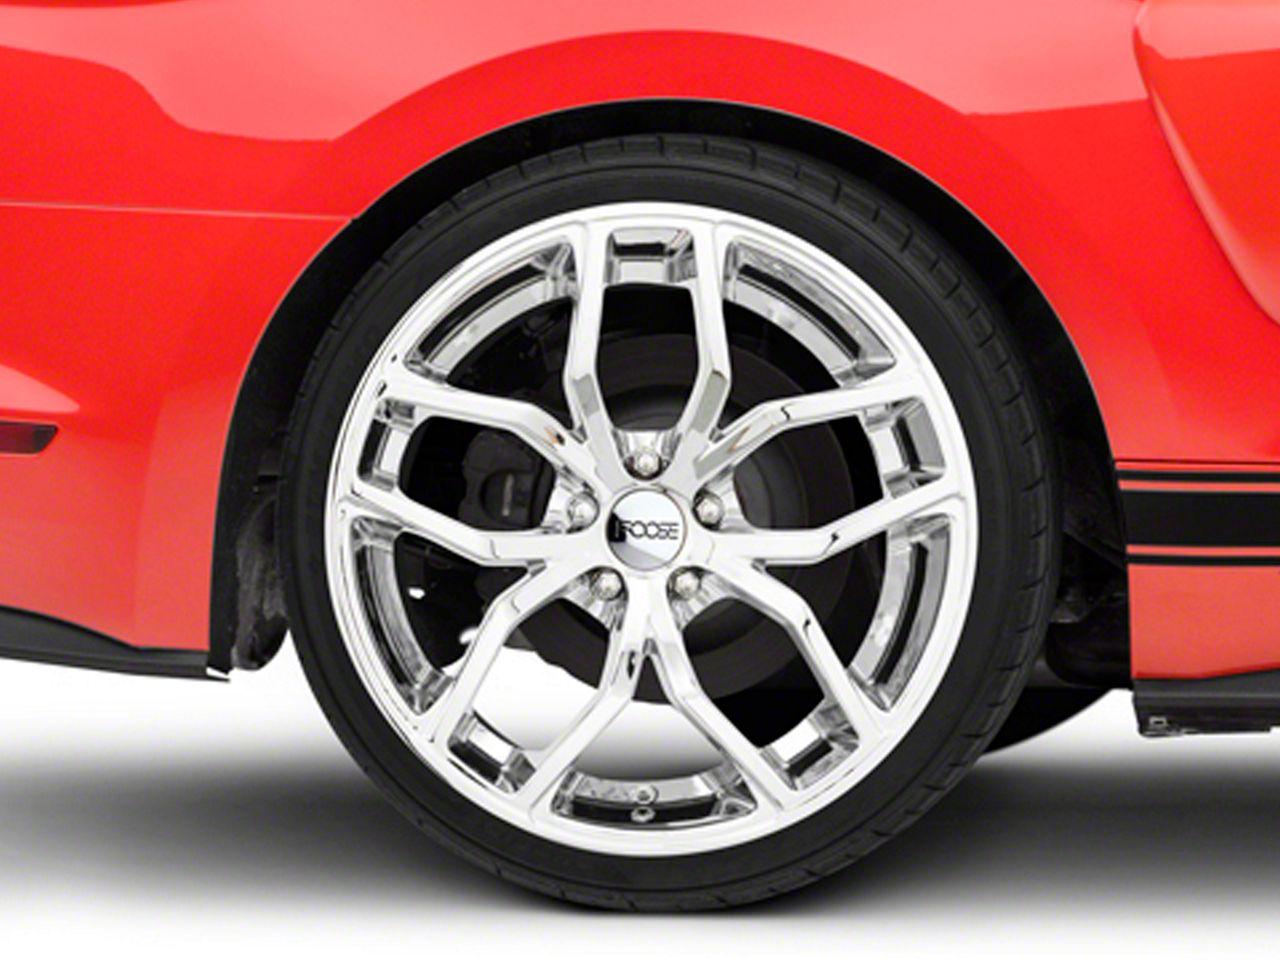 Foose Outcast Chrome Wheel - 20x10 - Rear Only (15-19 GT, EcoBoost, V6)